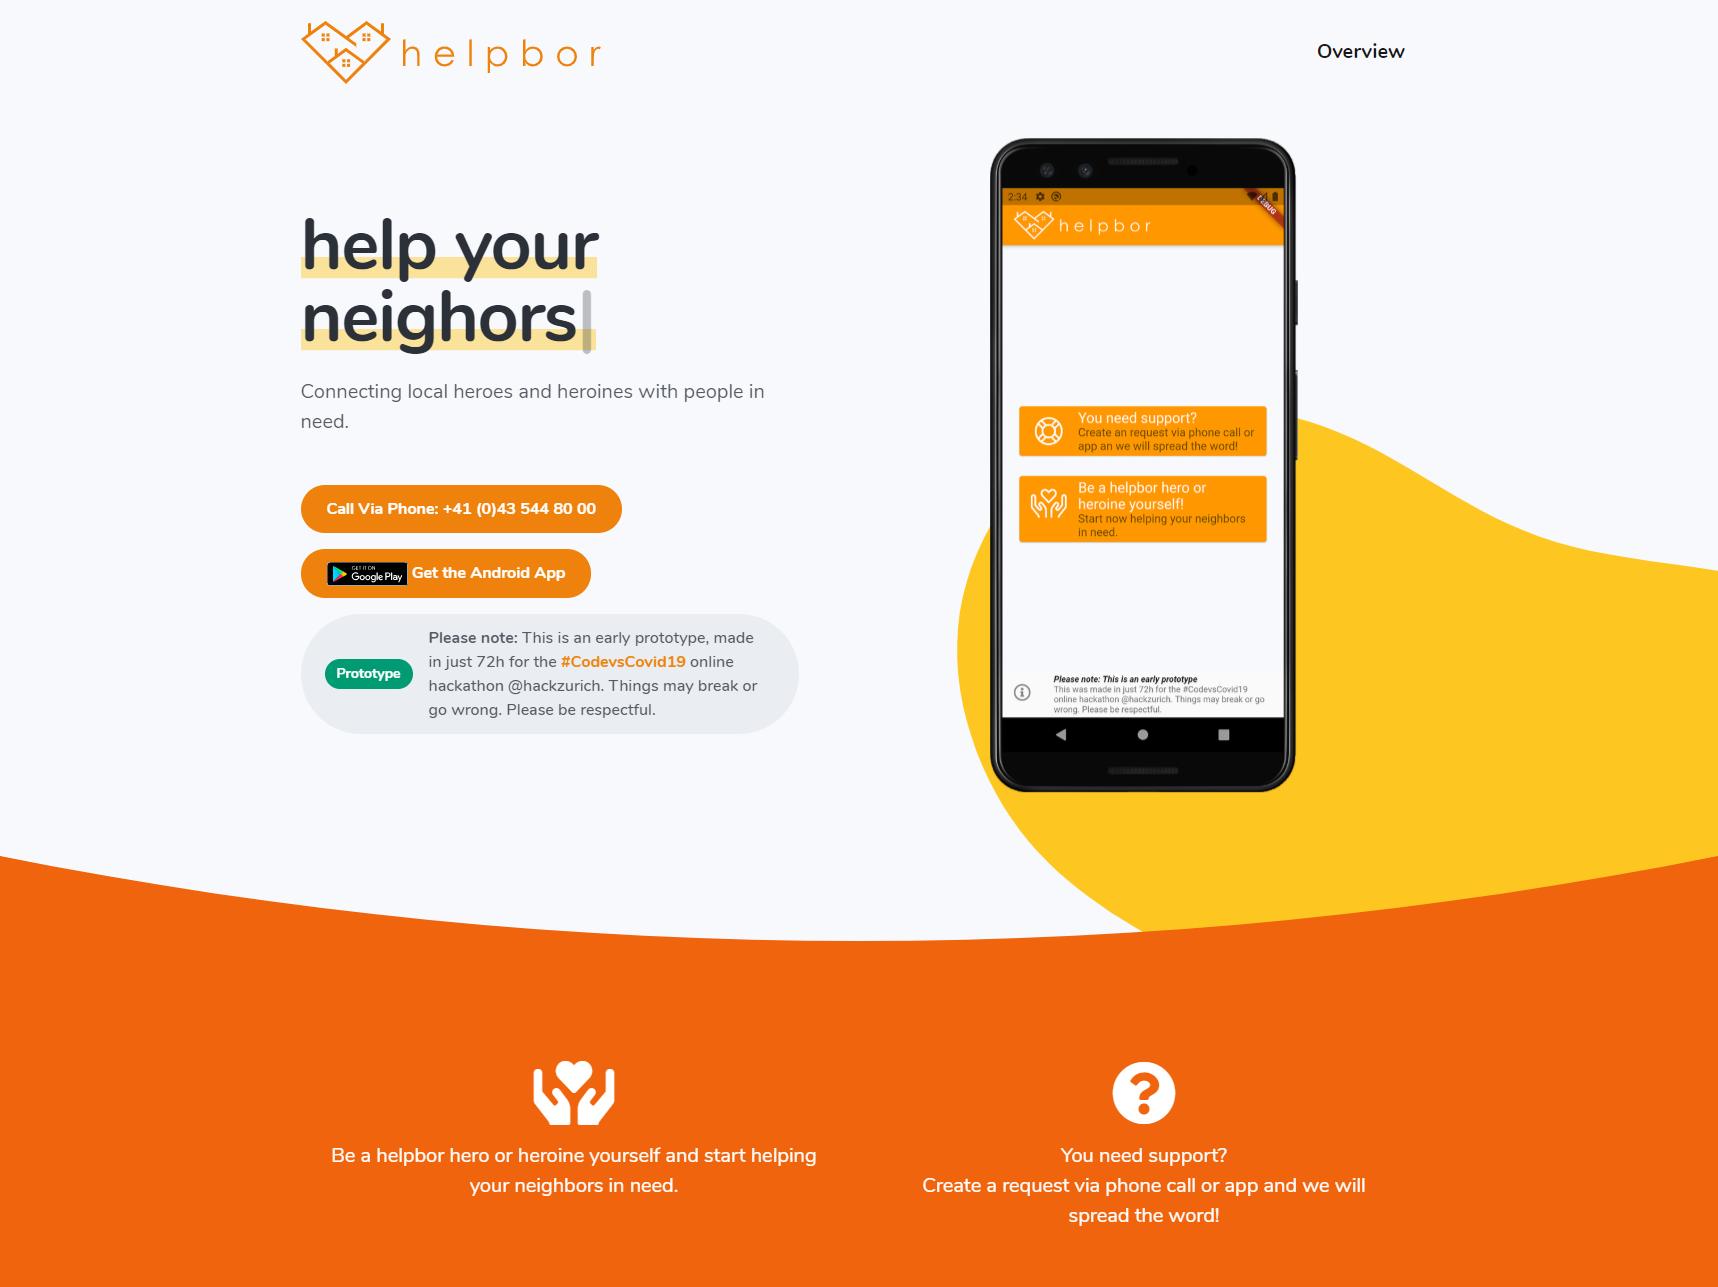 helpbor